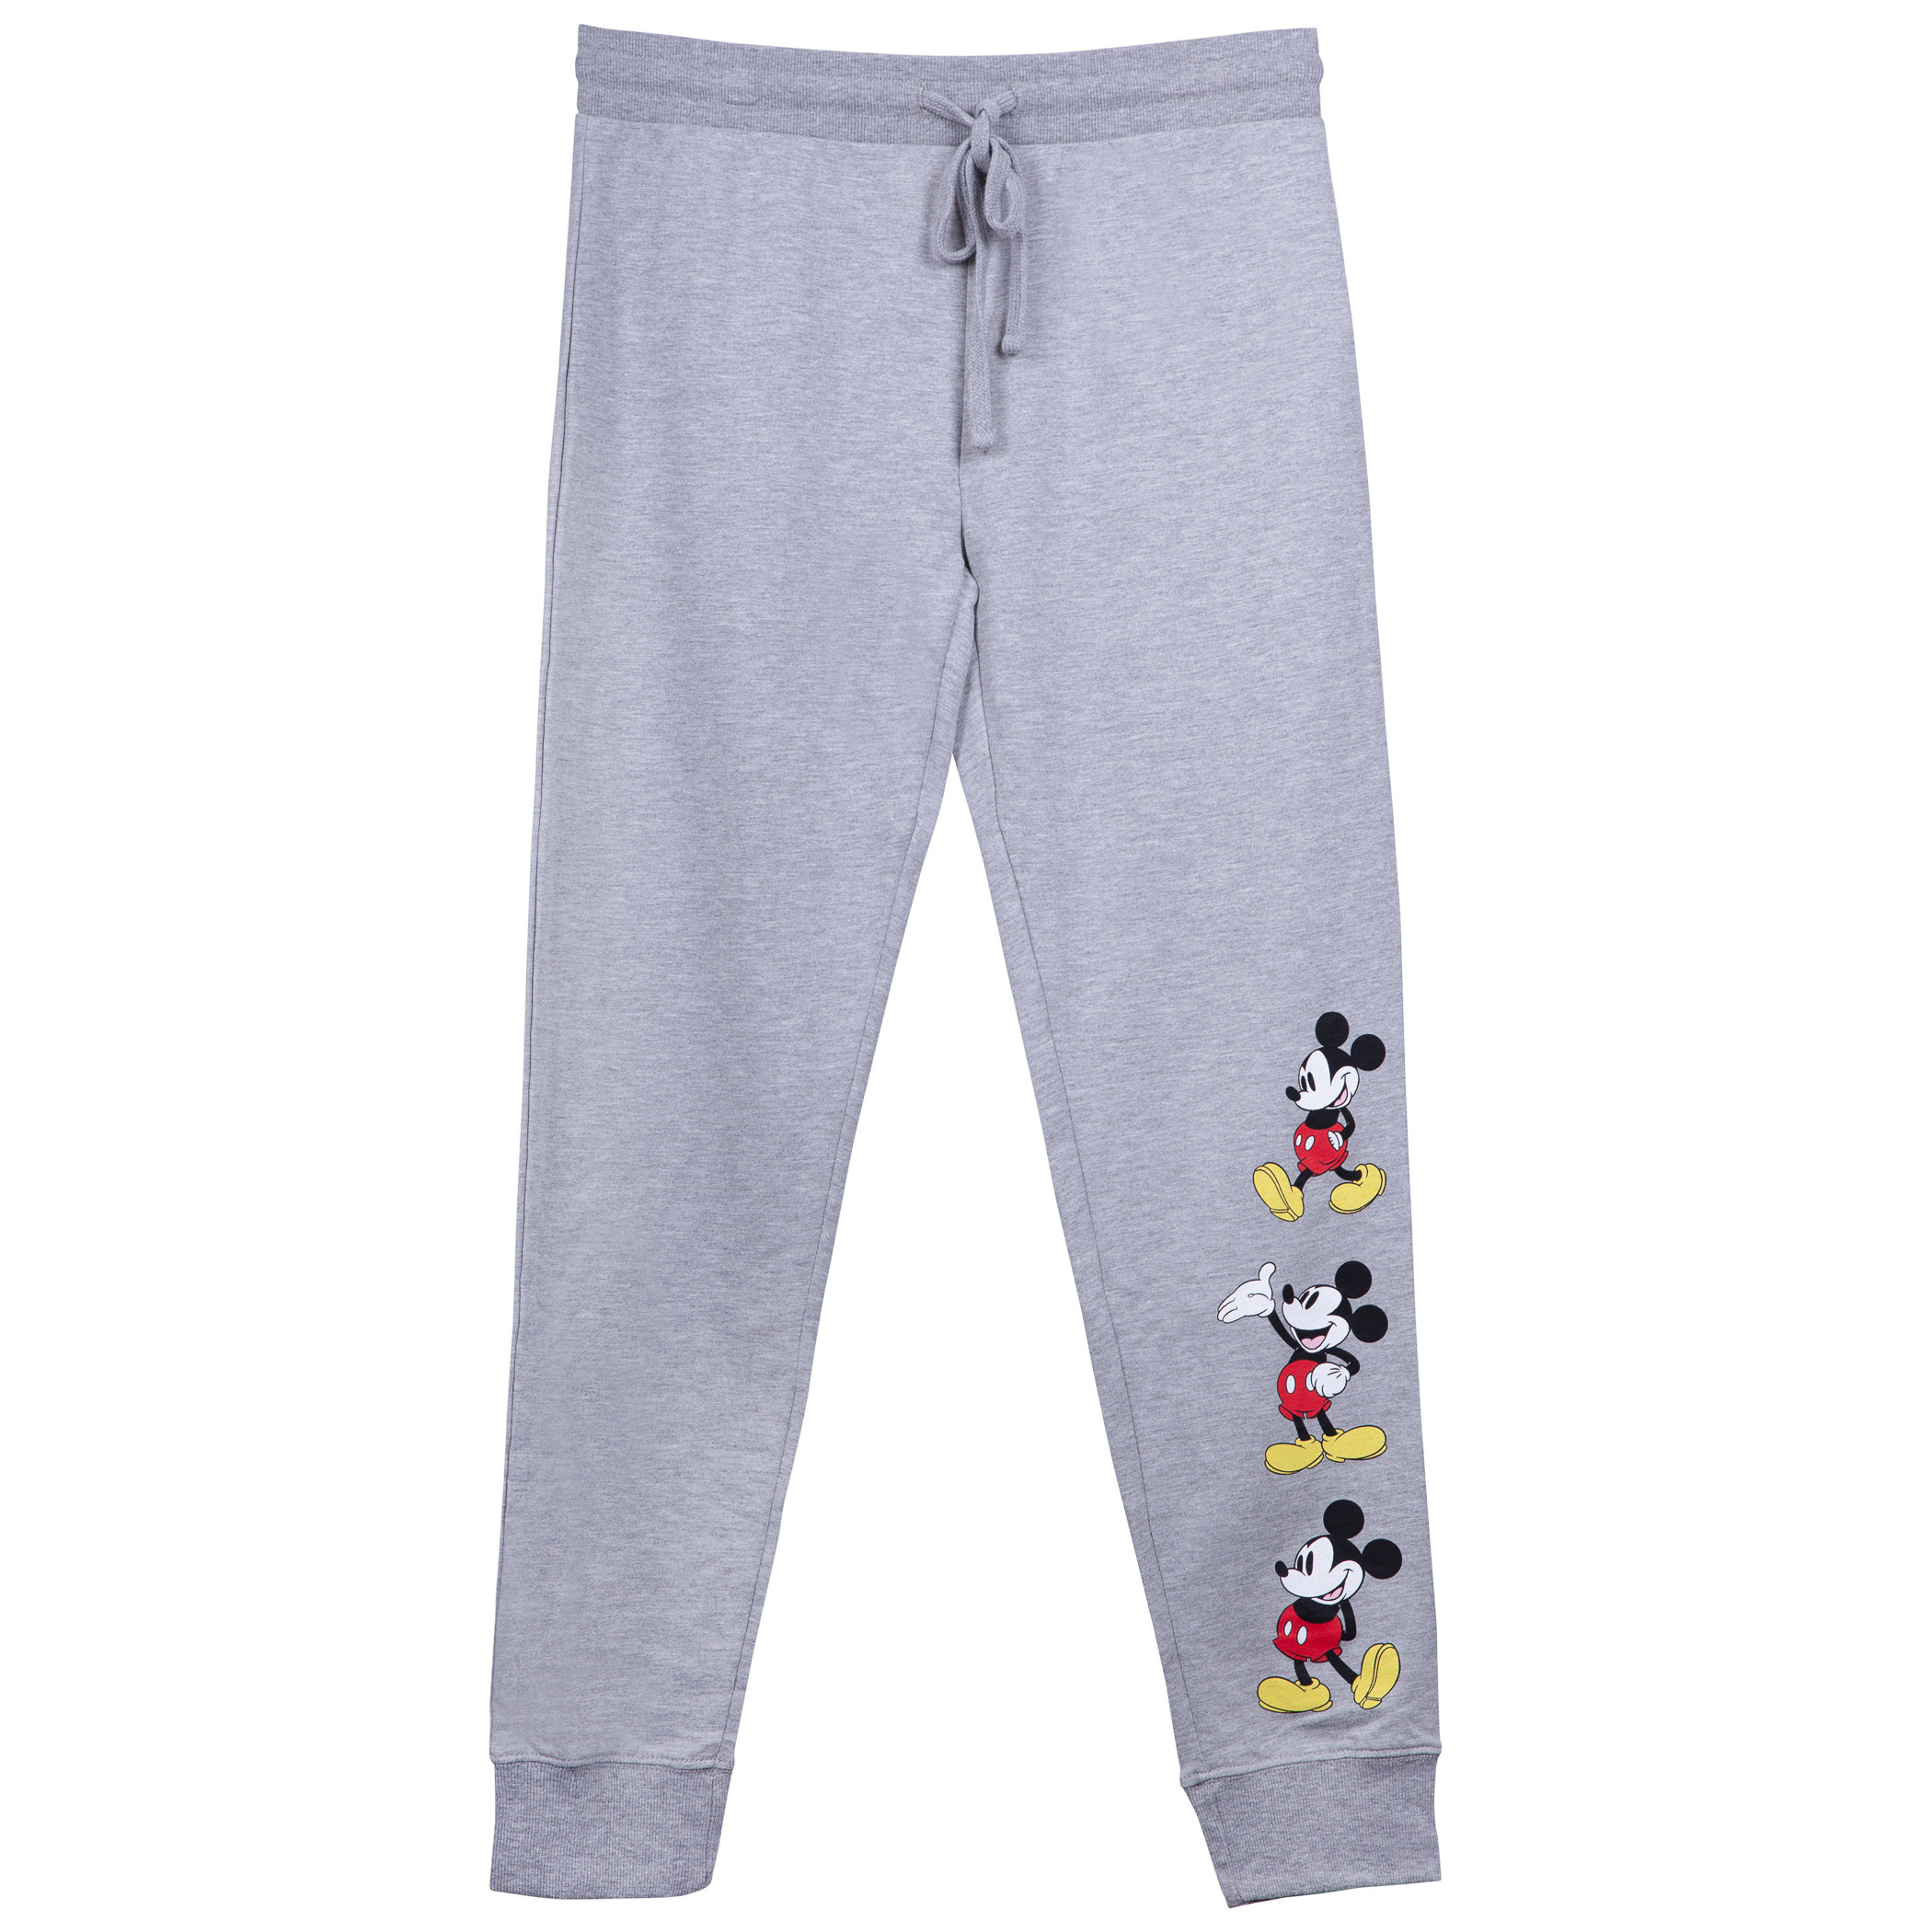 Mickey Mouse Women's Grey Sweatpants